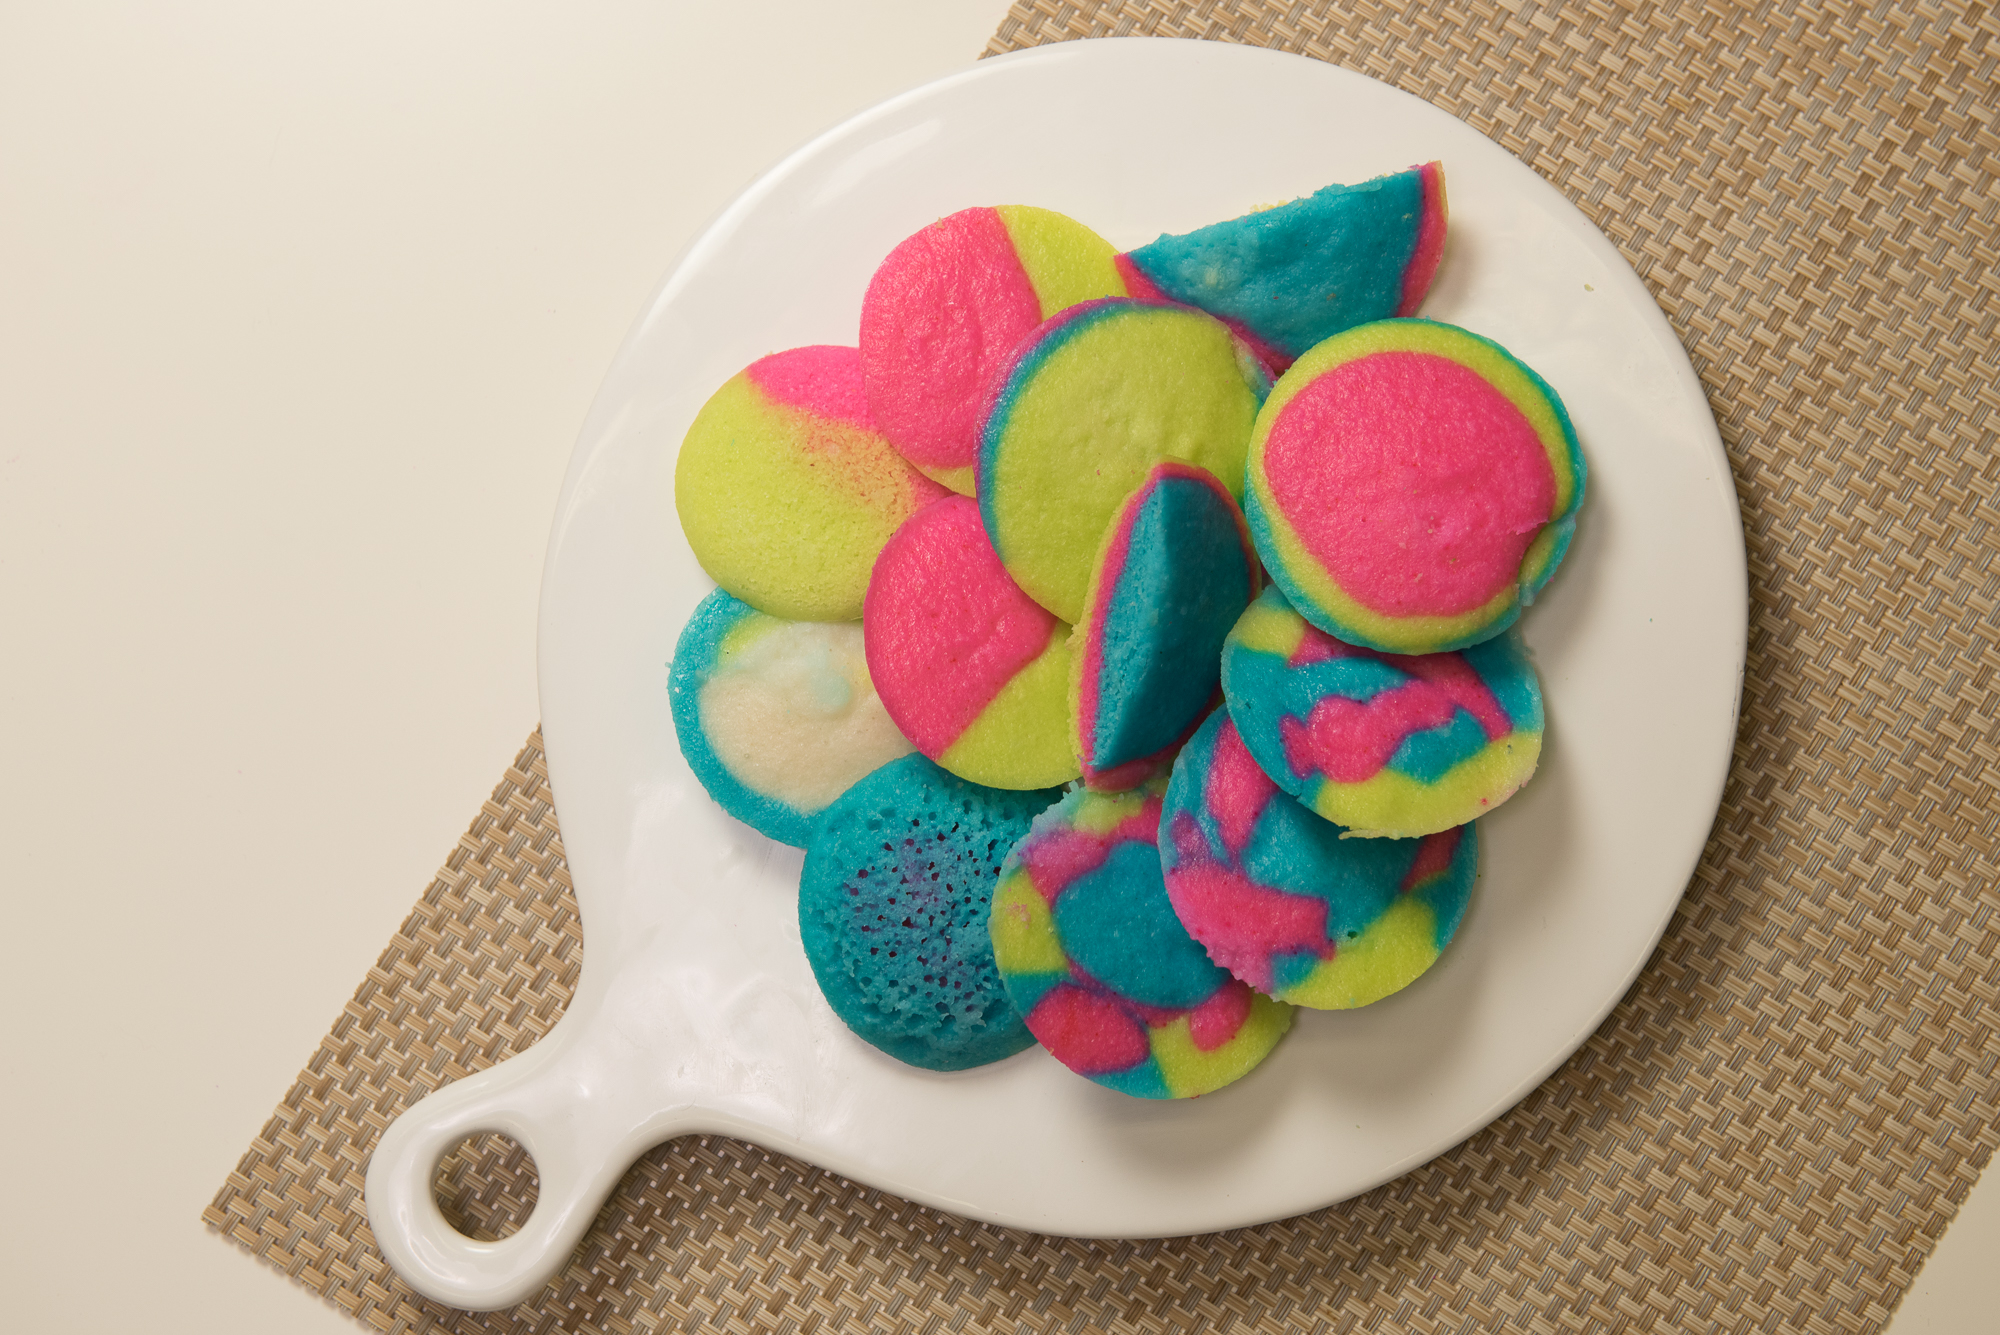 Rainbow Idli How To | Pink Chai Living